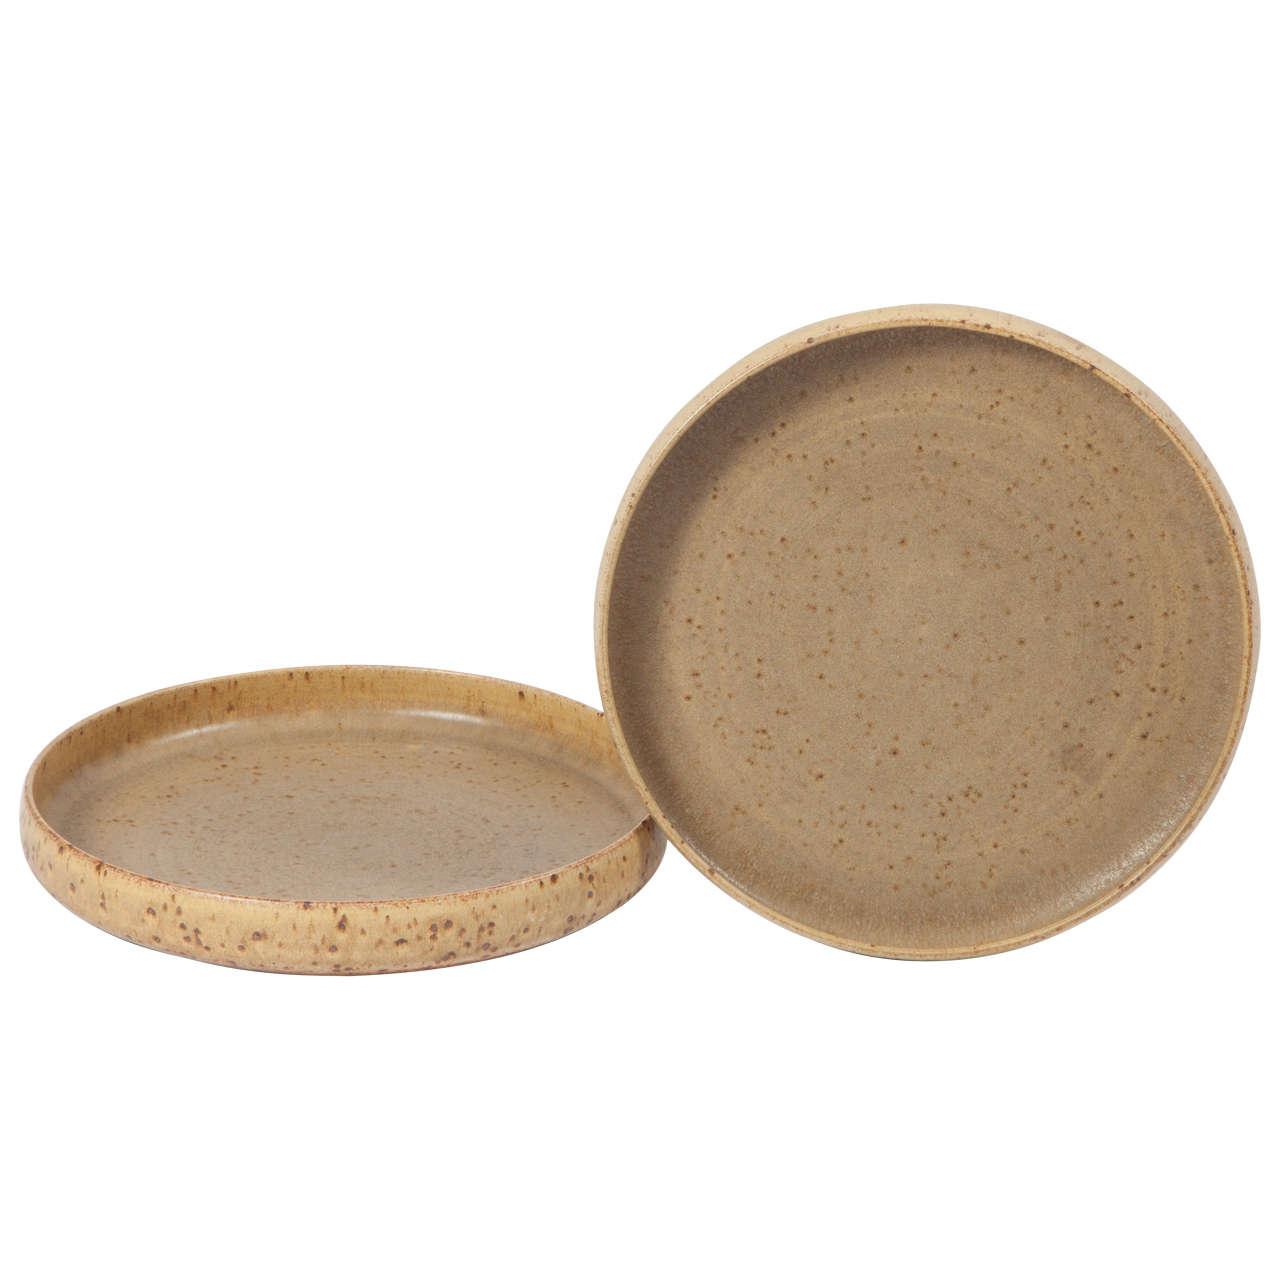 Per Linnemann Schmidt Stoneware Serving Plates, Pair 1